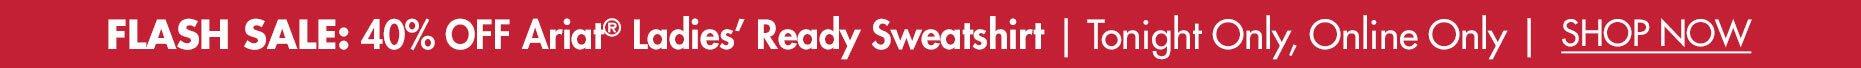 Flash Sale: 40% OFF Ariat® Ladies' Ready Sweatshirt